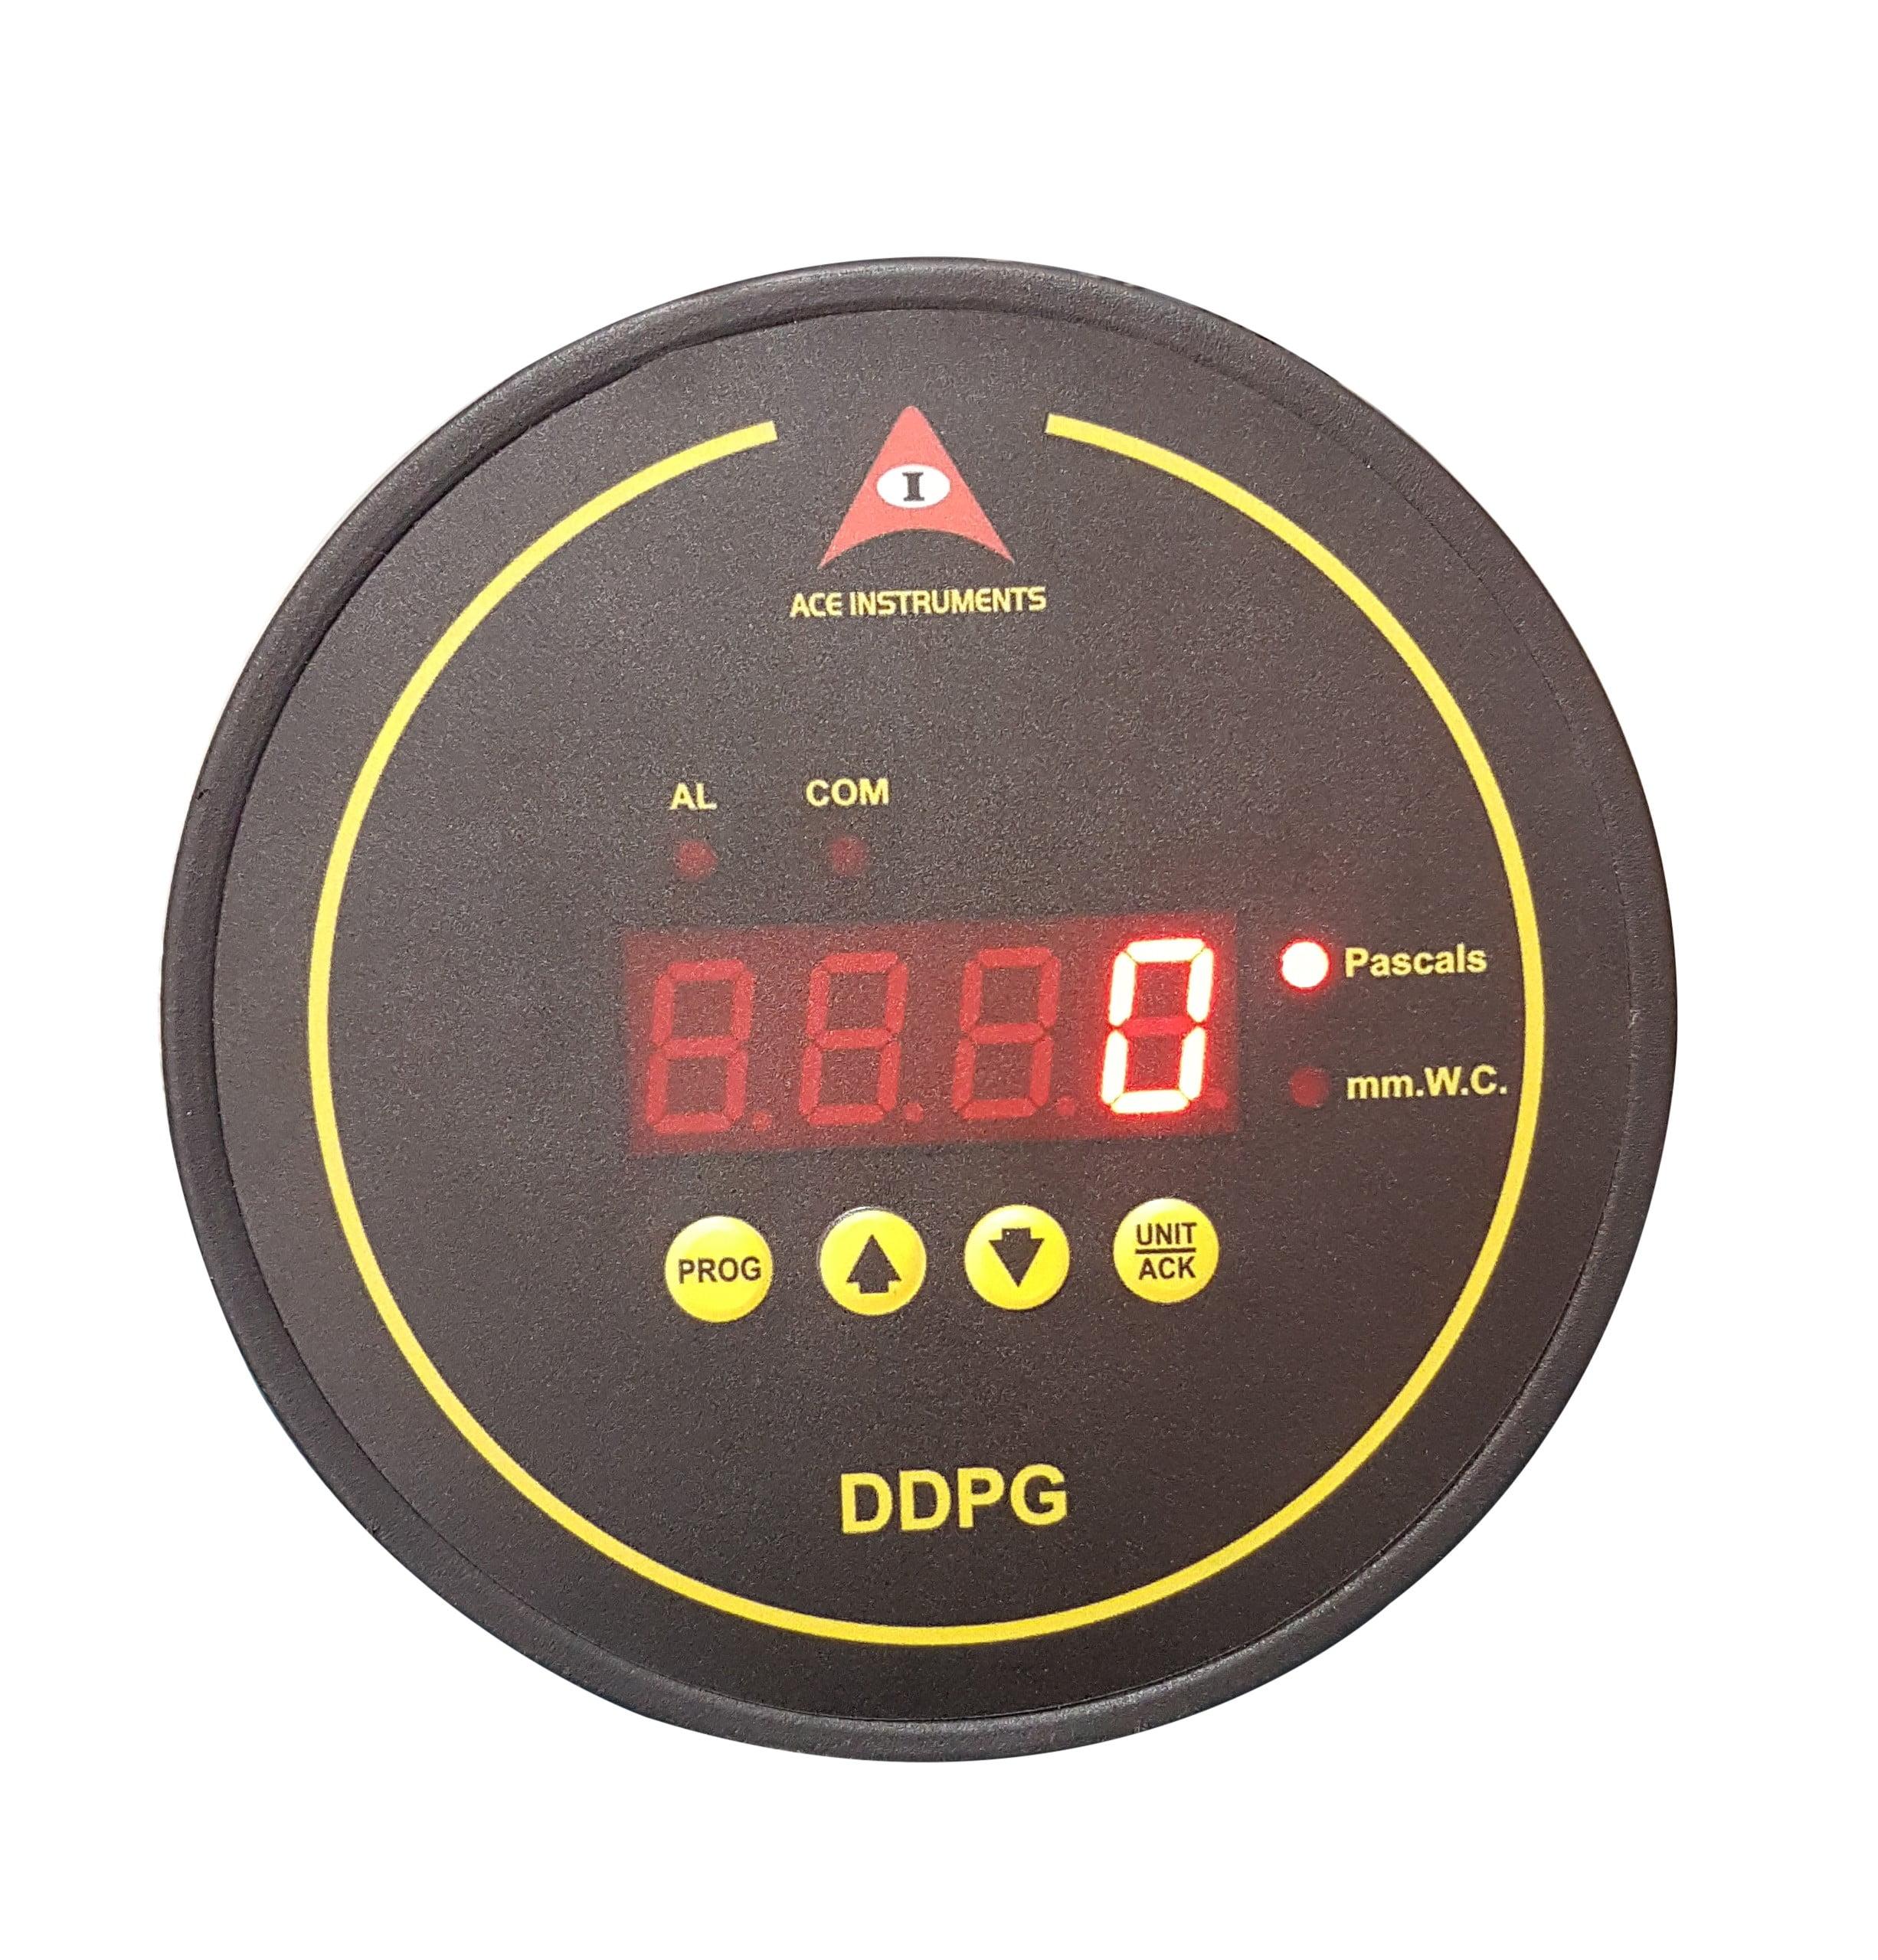 Differential Pressure Gauge, Digital Differential Pressure Gauge